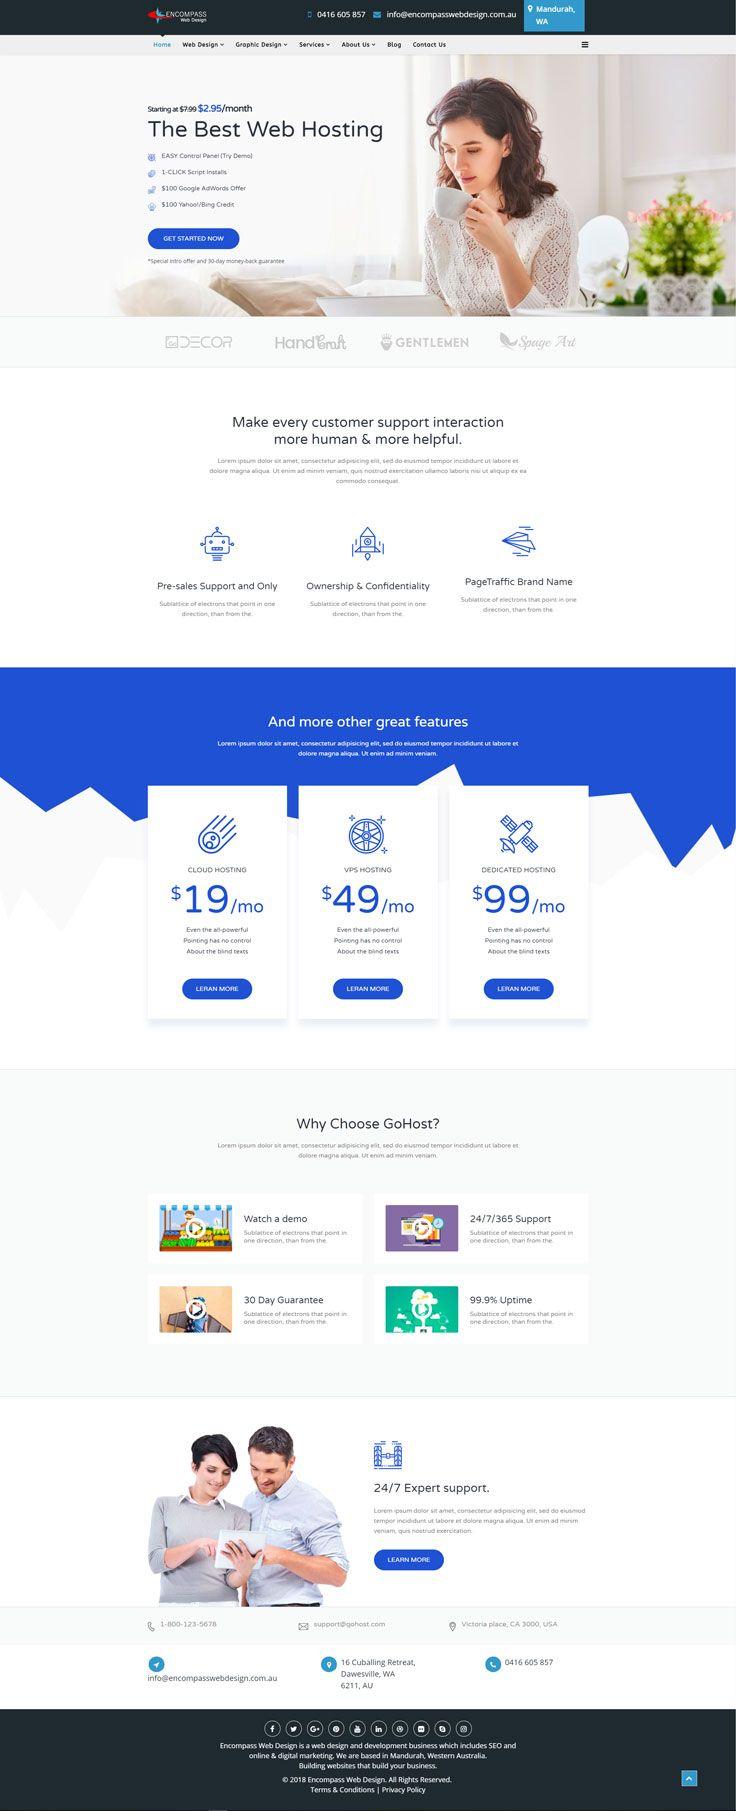 Encompass Web Design Building Websites That Build Your Business Demo Joomla Template Web Design Simple Web Design Web Template Design